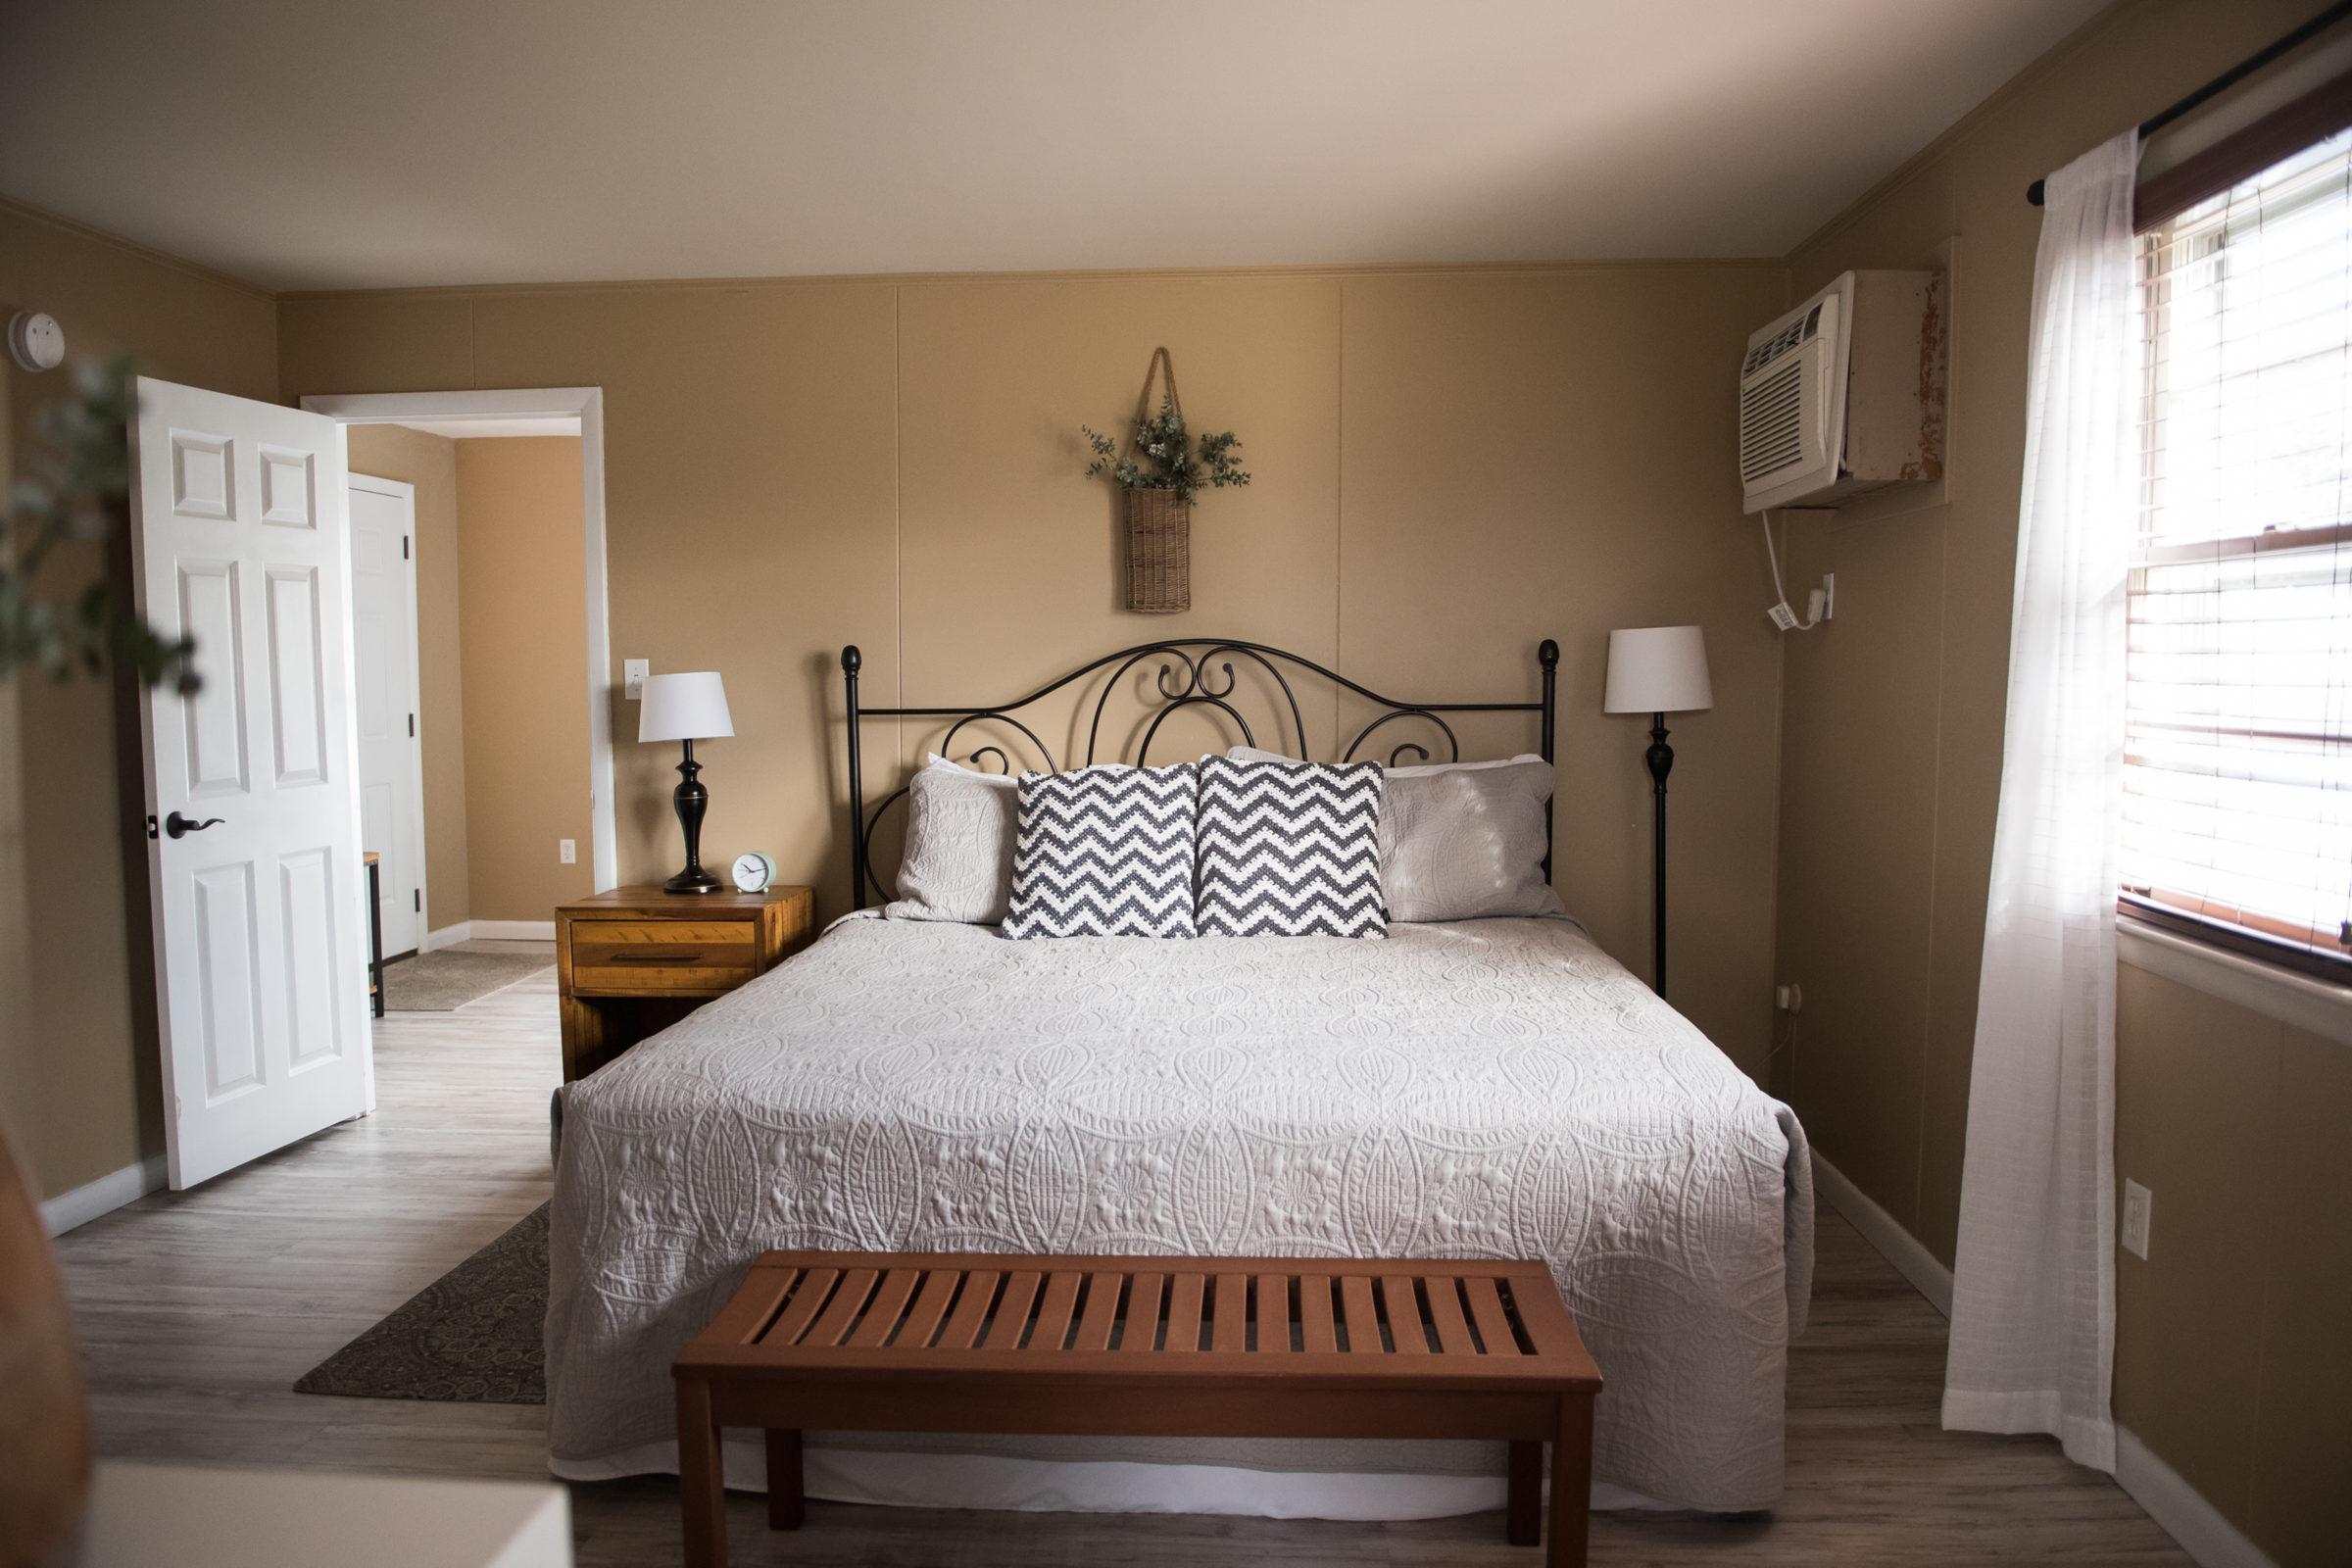 King Suite Bedroom.jpeg(high res) (website)